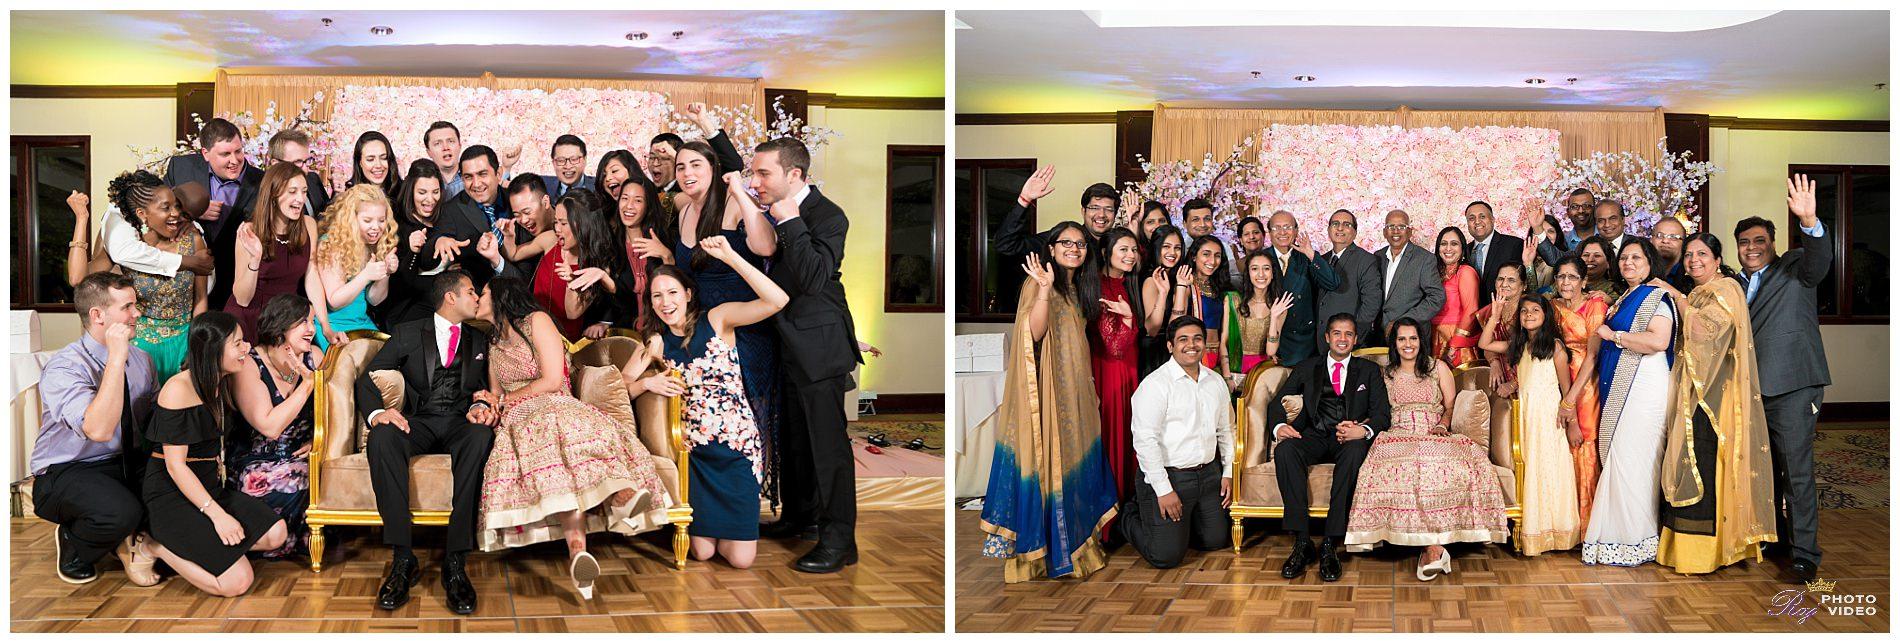 Martinsville-Gardens-NJ-Indian-Wedding-Ruchi-Vishal-71.jpg